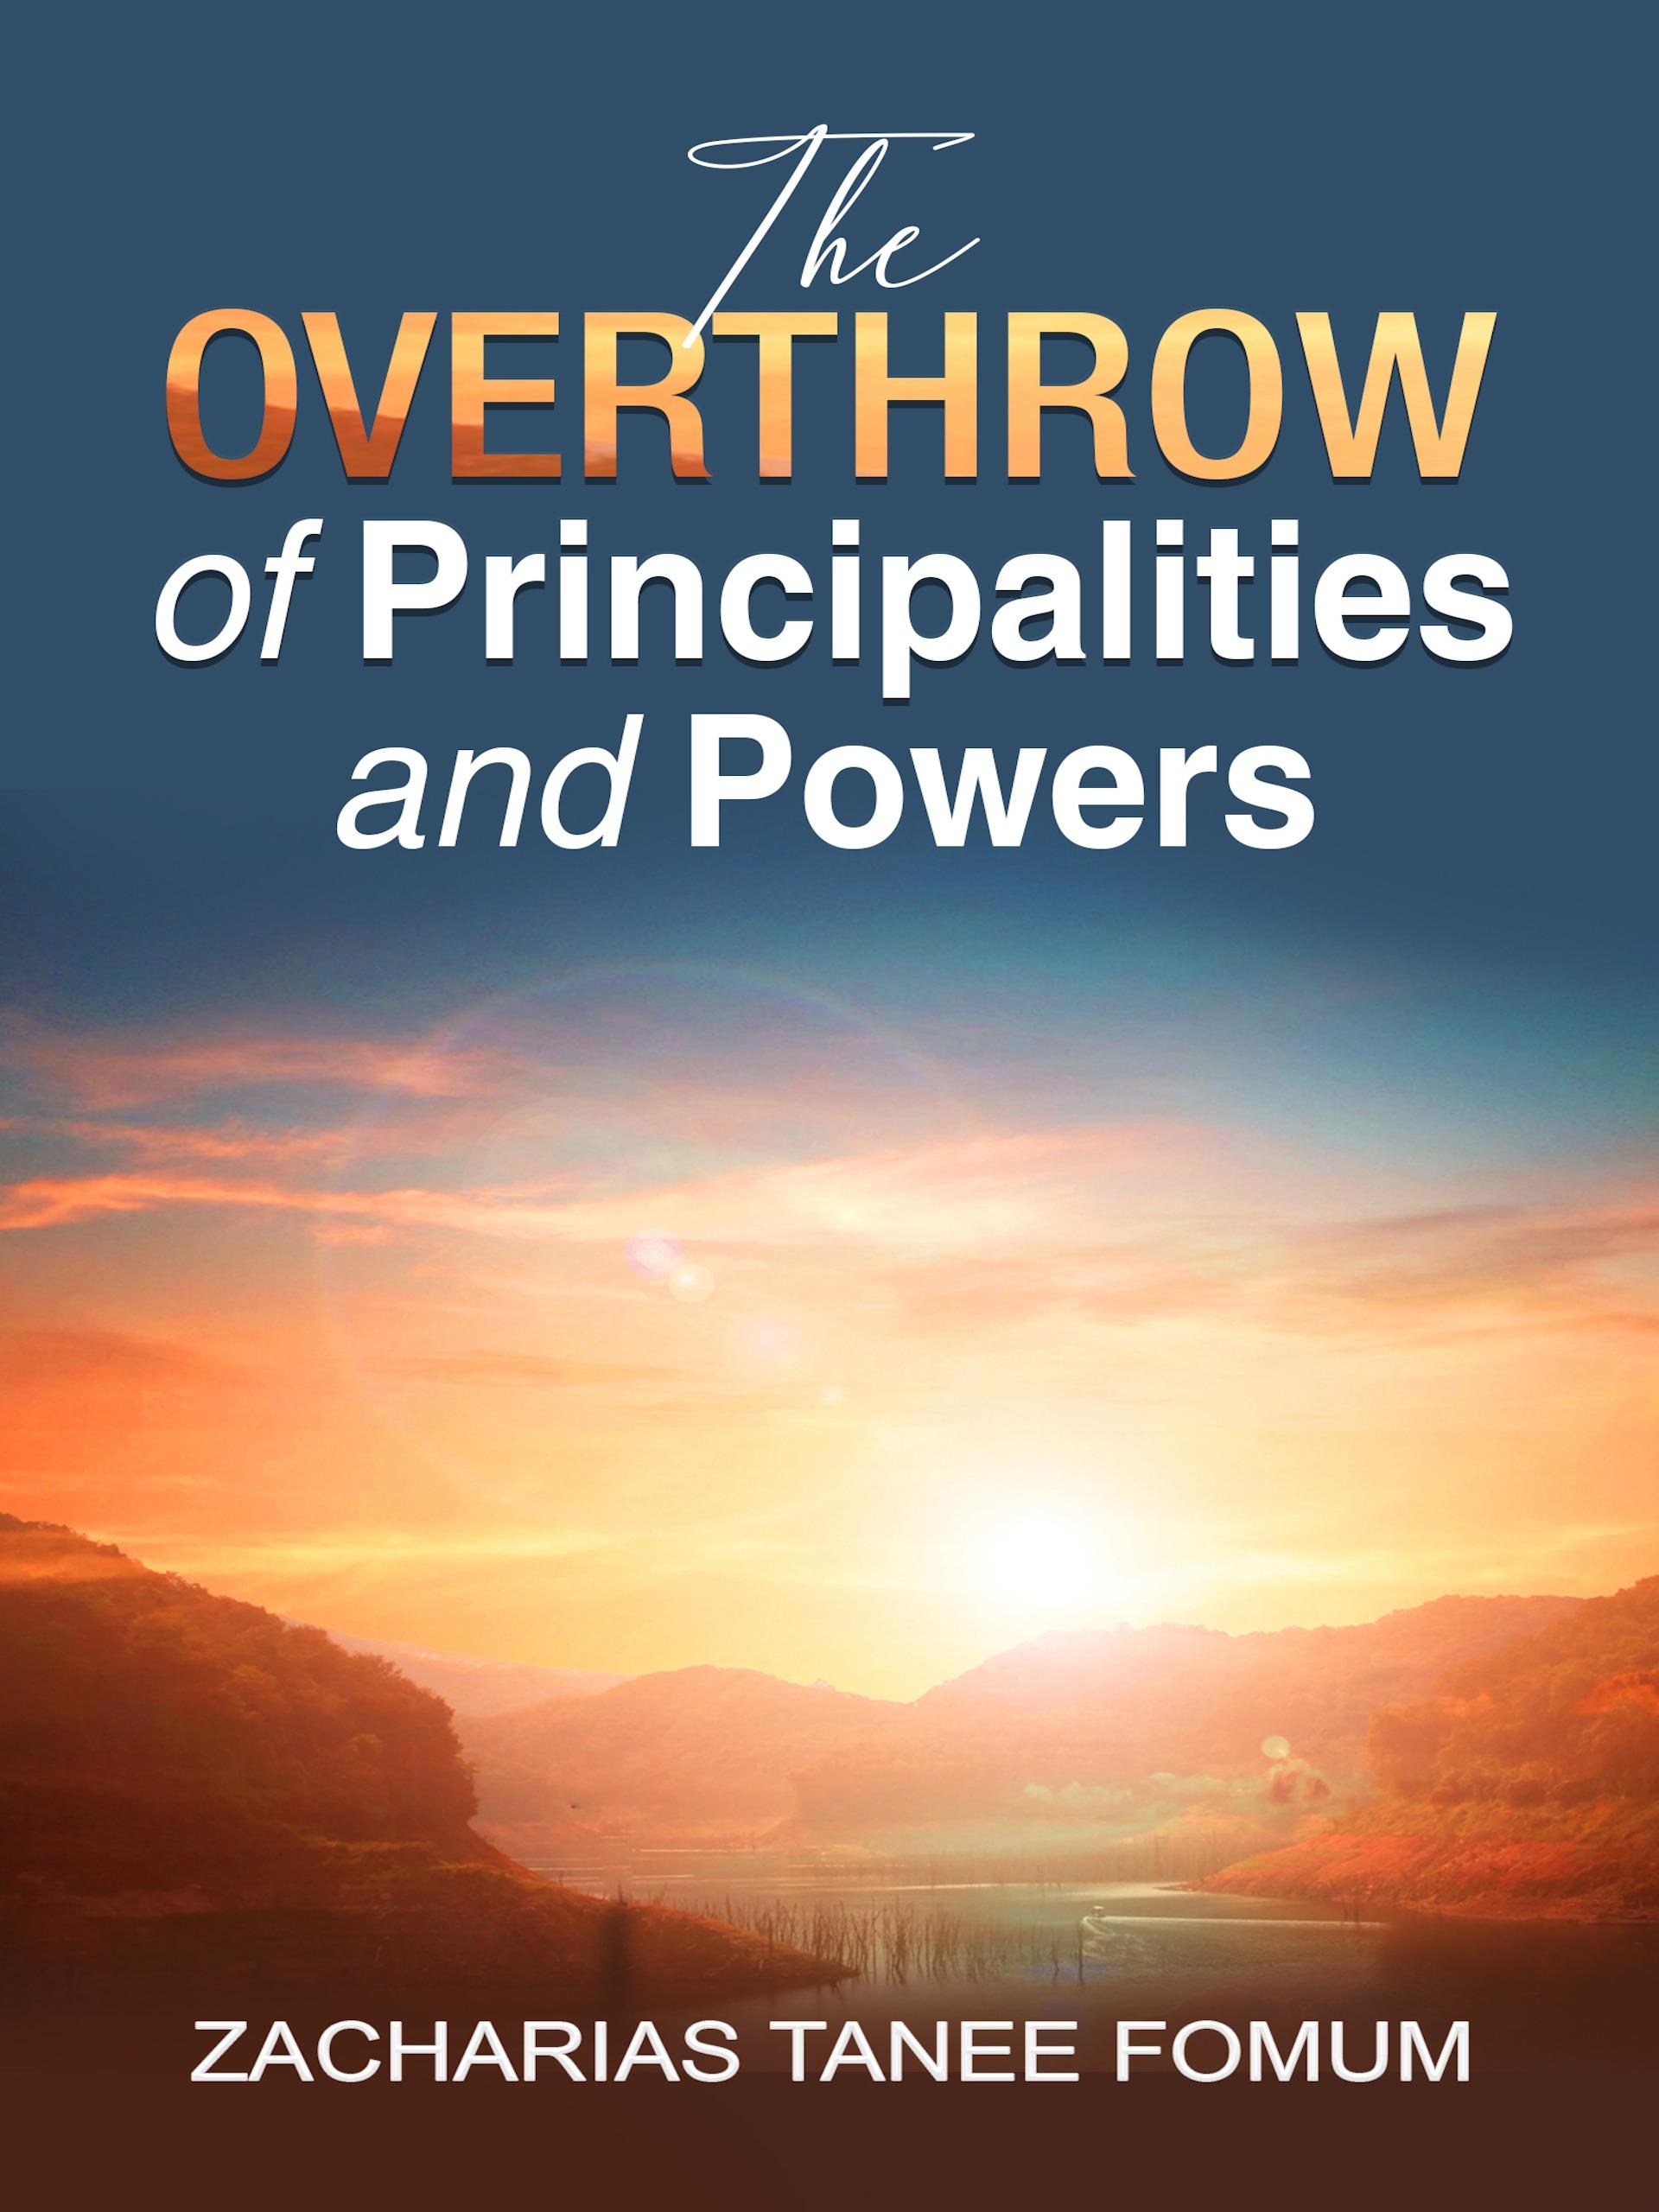 The Overthrow of Principalities and Powers